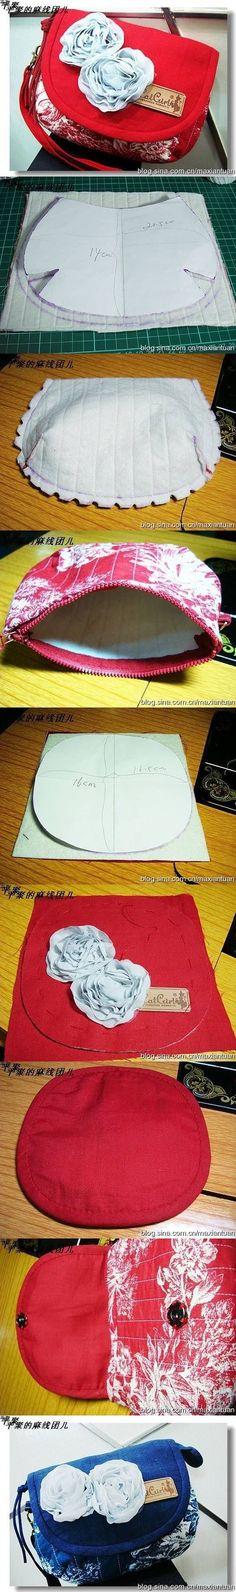 How to make Cute Mini Handbag DIY tutorial instructions / How To Instructions